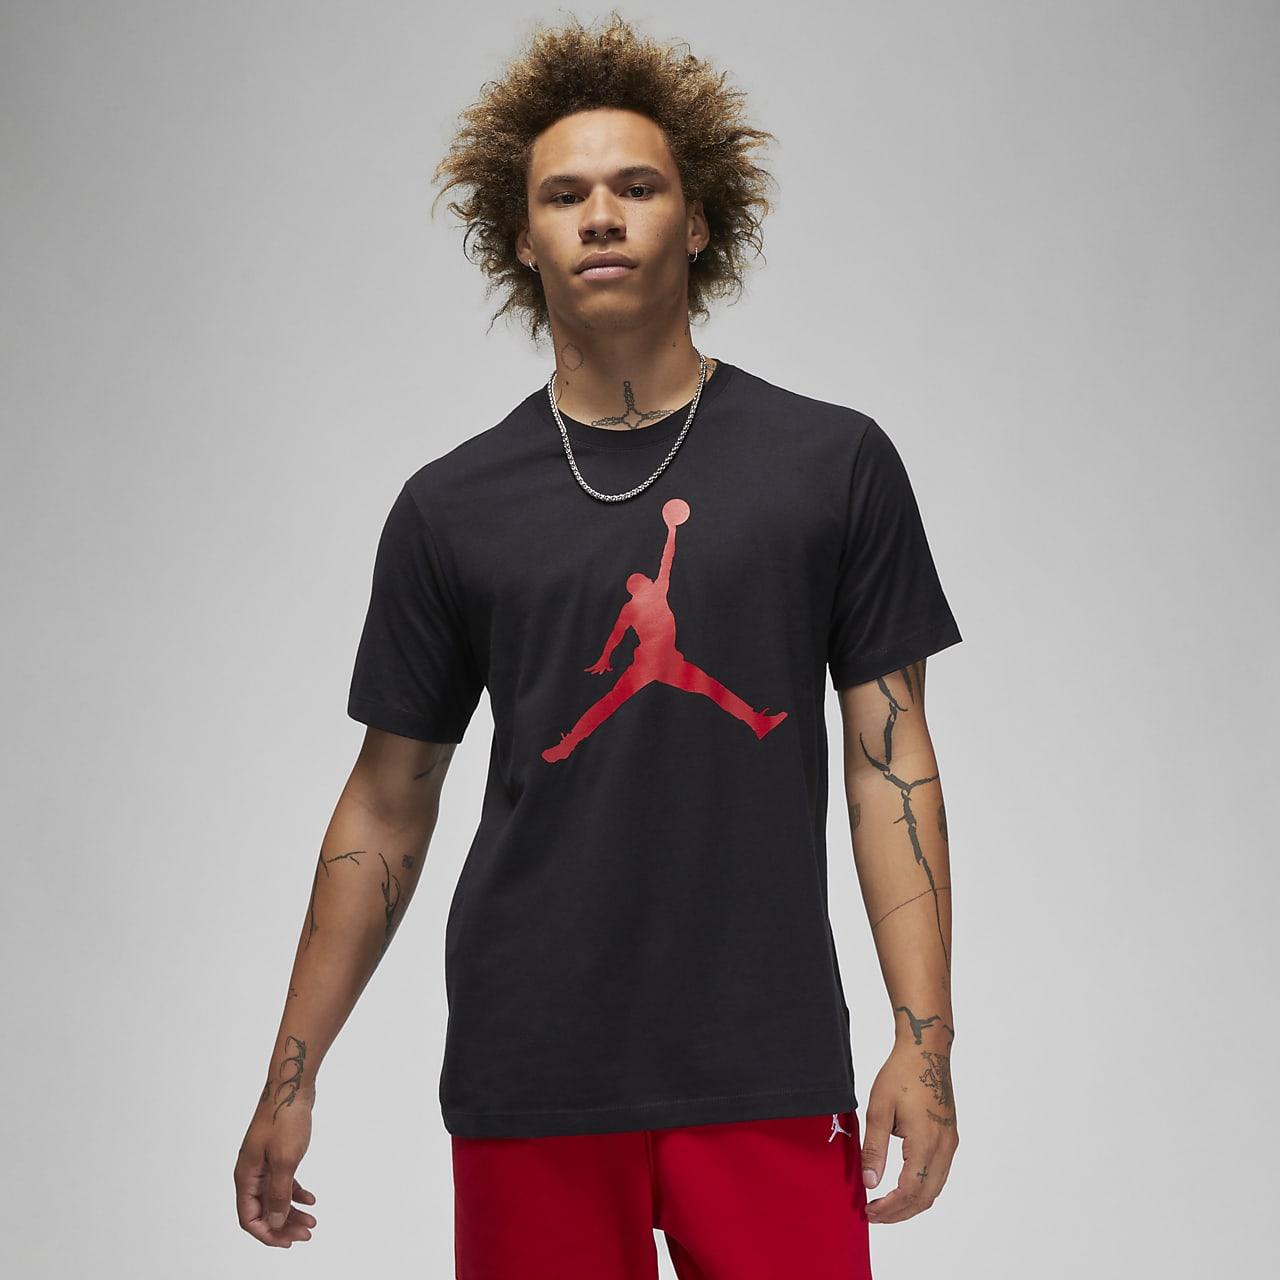 meilleure sélection 7eb1f c1d04 Jordan Jumpman Men's T-Shirt